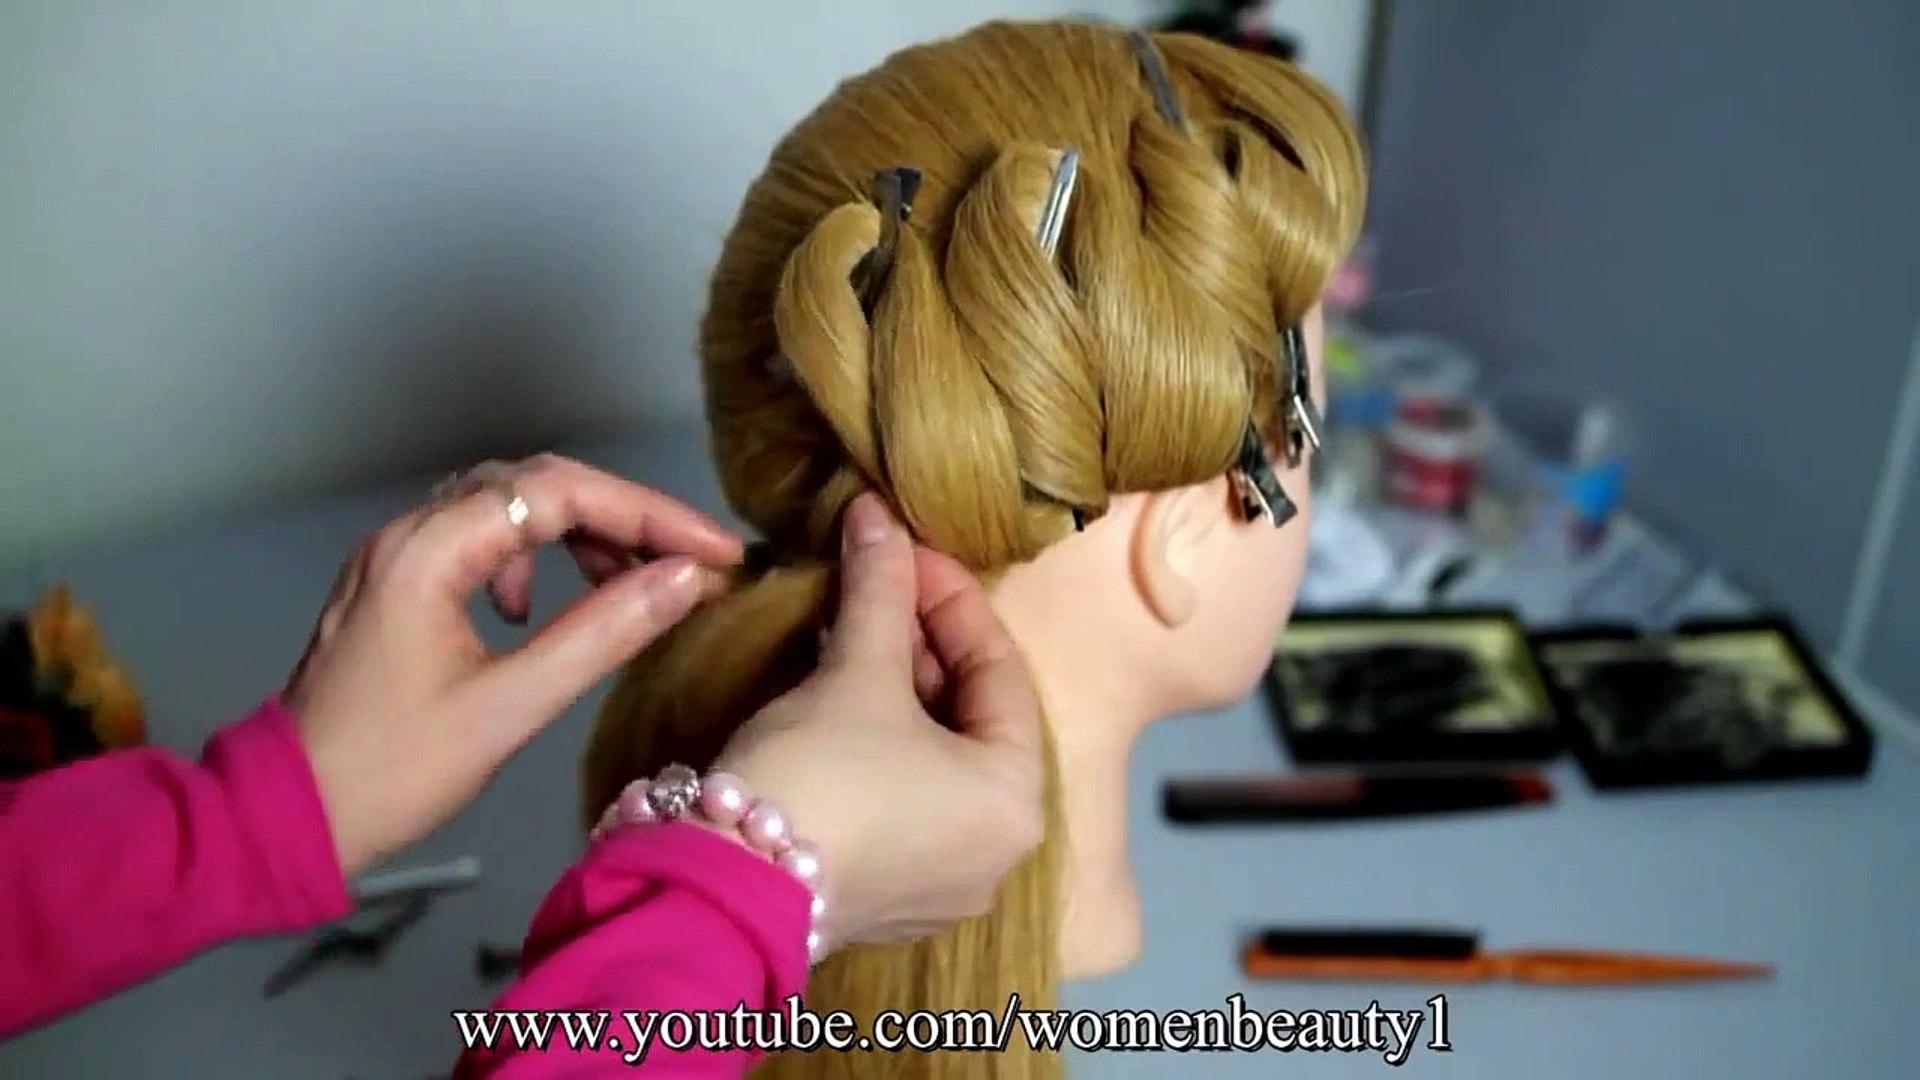 Easy Hairstyle Video DIY hair style ideas hair styles for long hair new